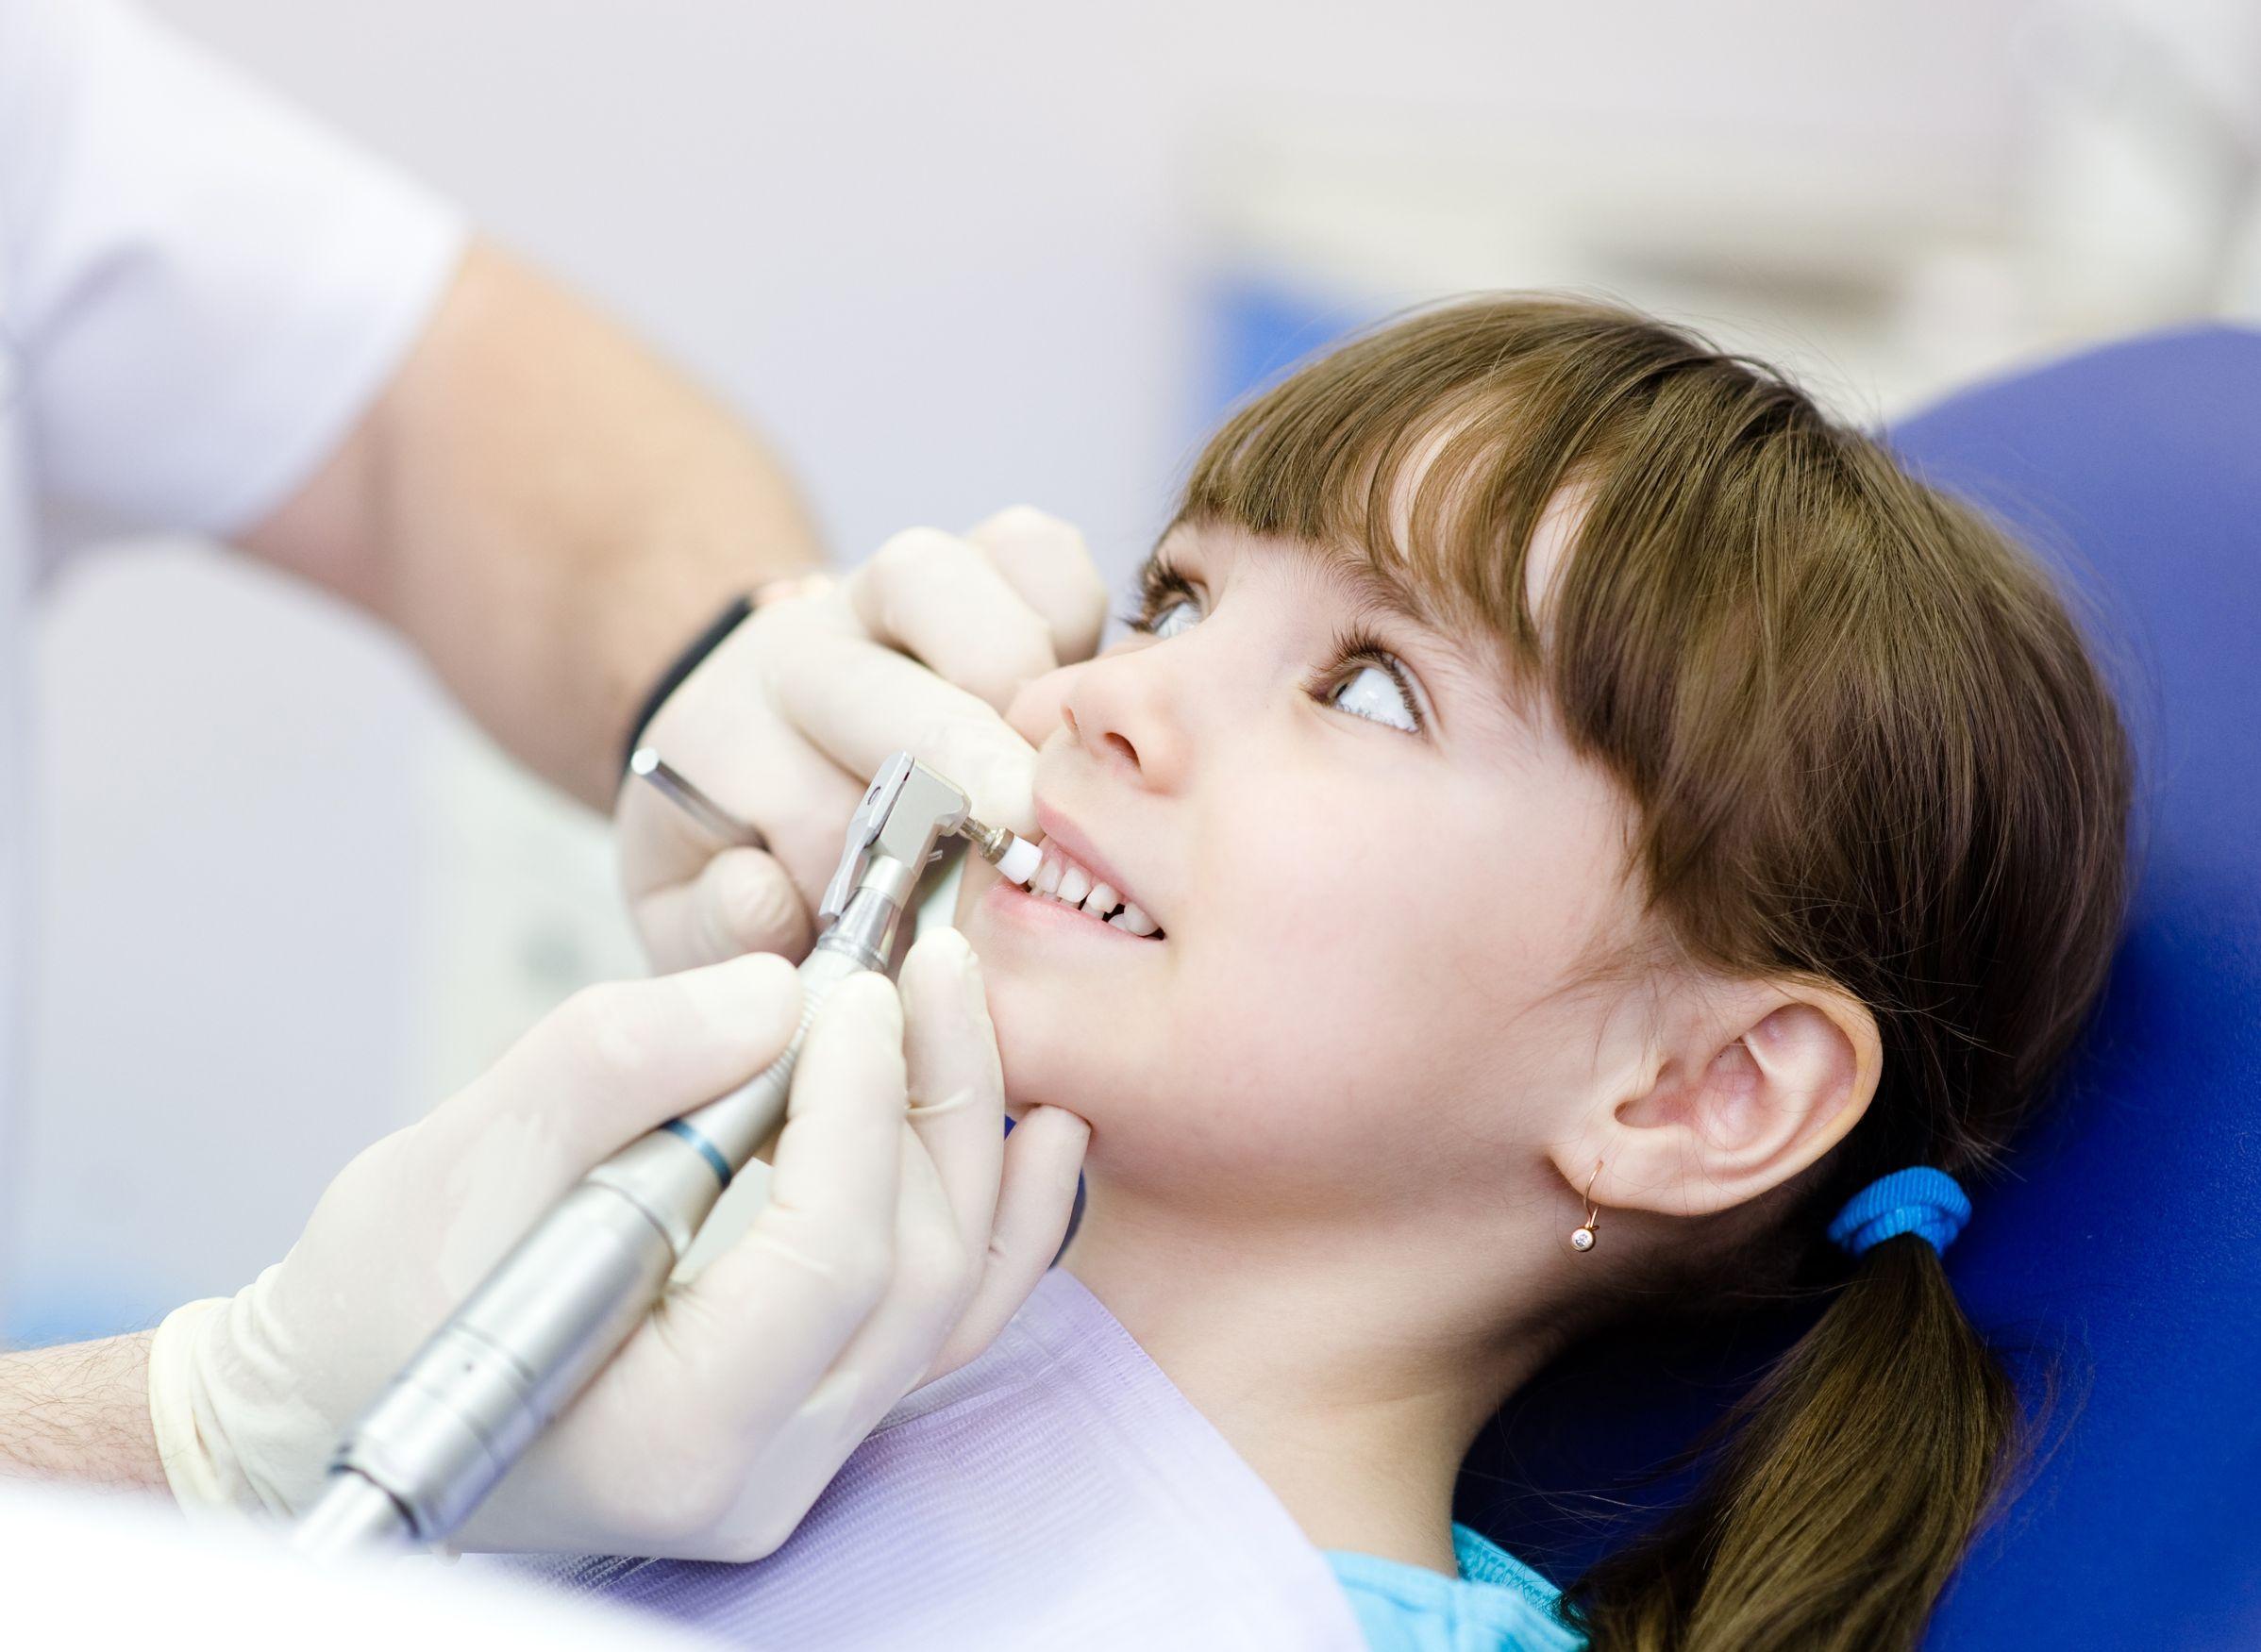 Child Teeth Cleaning Illustration